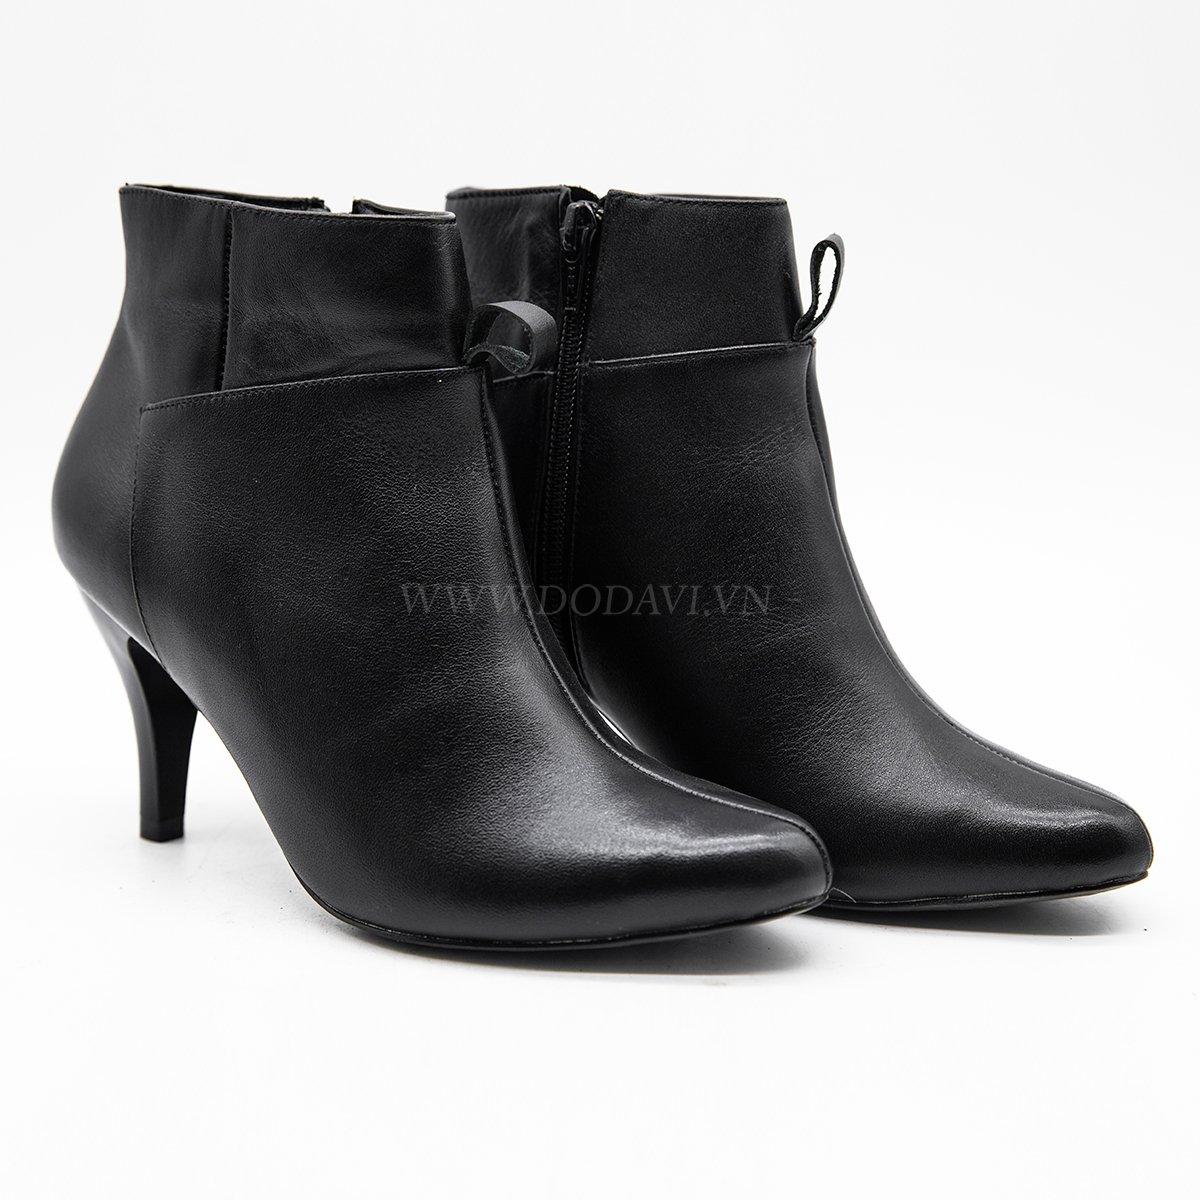 Boot da nữ cổ thấp BT07.37